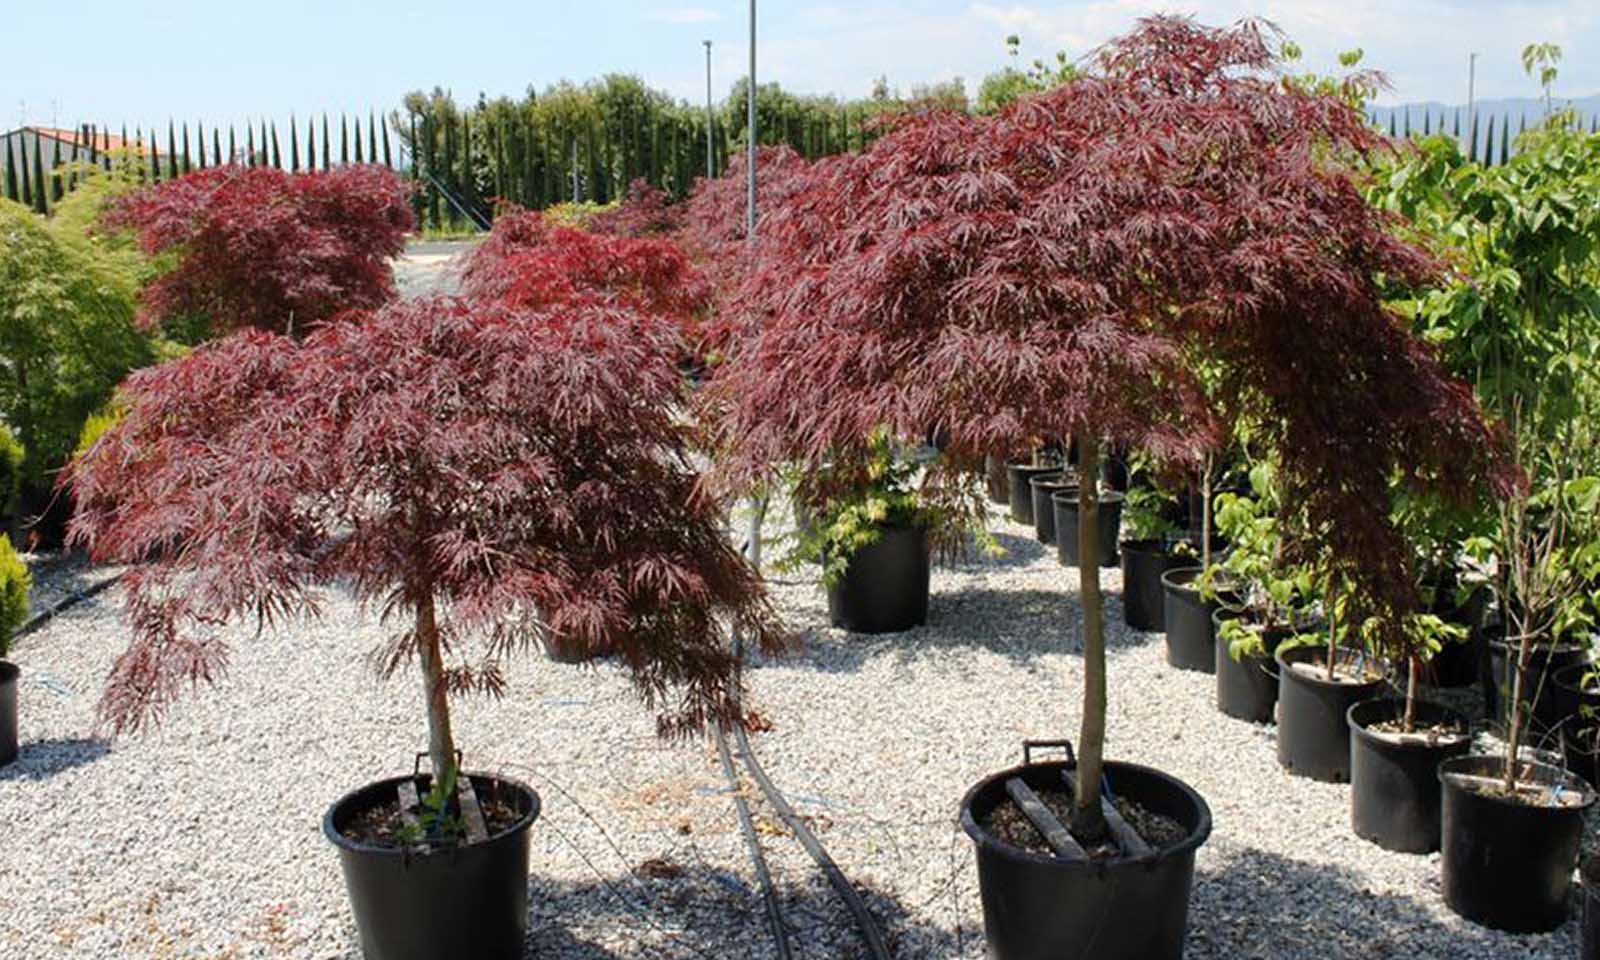 Acer Palmatum Dissectum 'Garnet' (Japanese Maple 'Garnet') - Half standard